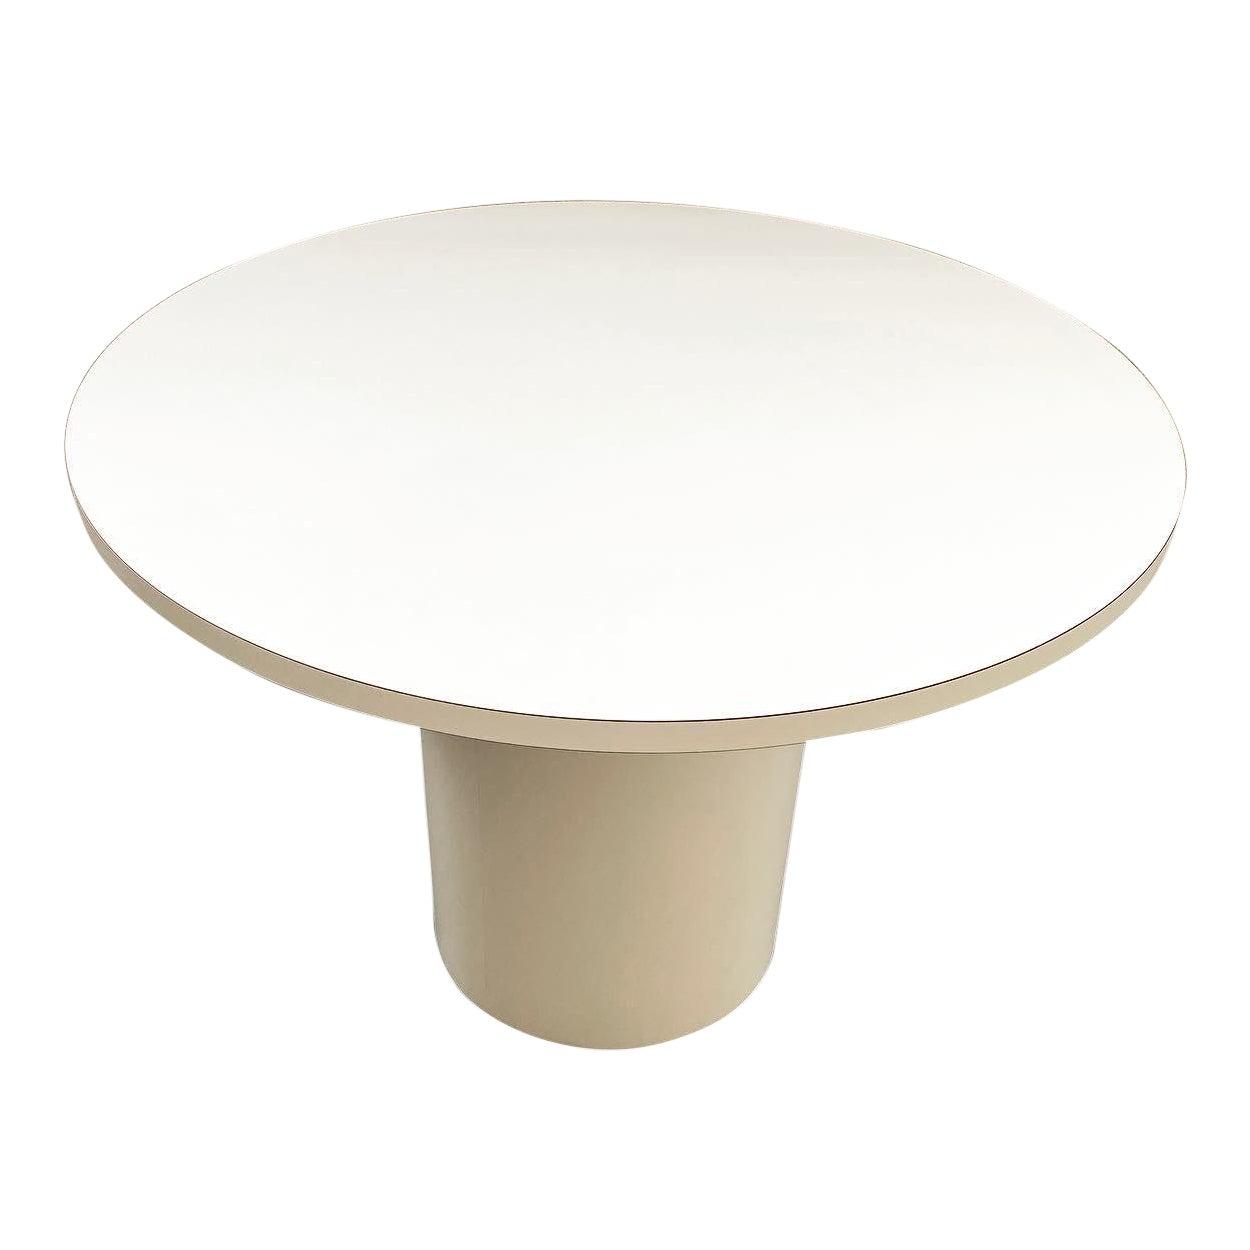 Vintage Round White Laminate Dining, Round White Dining Table With Pedestal Base